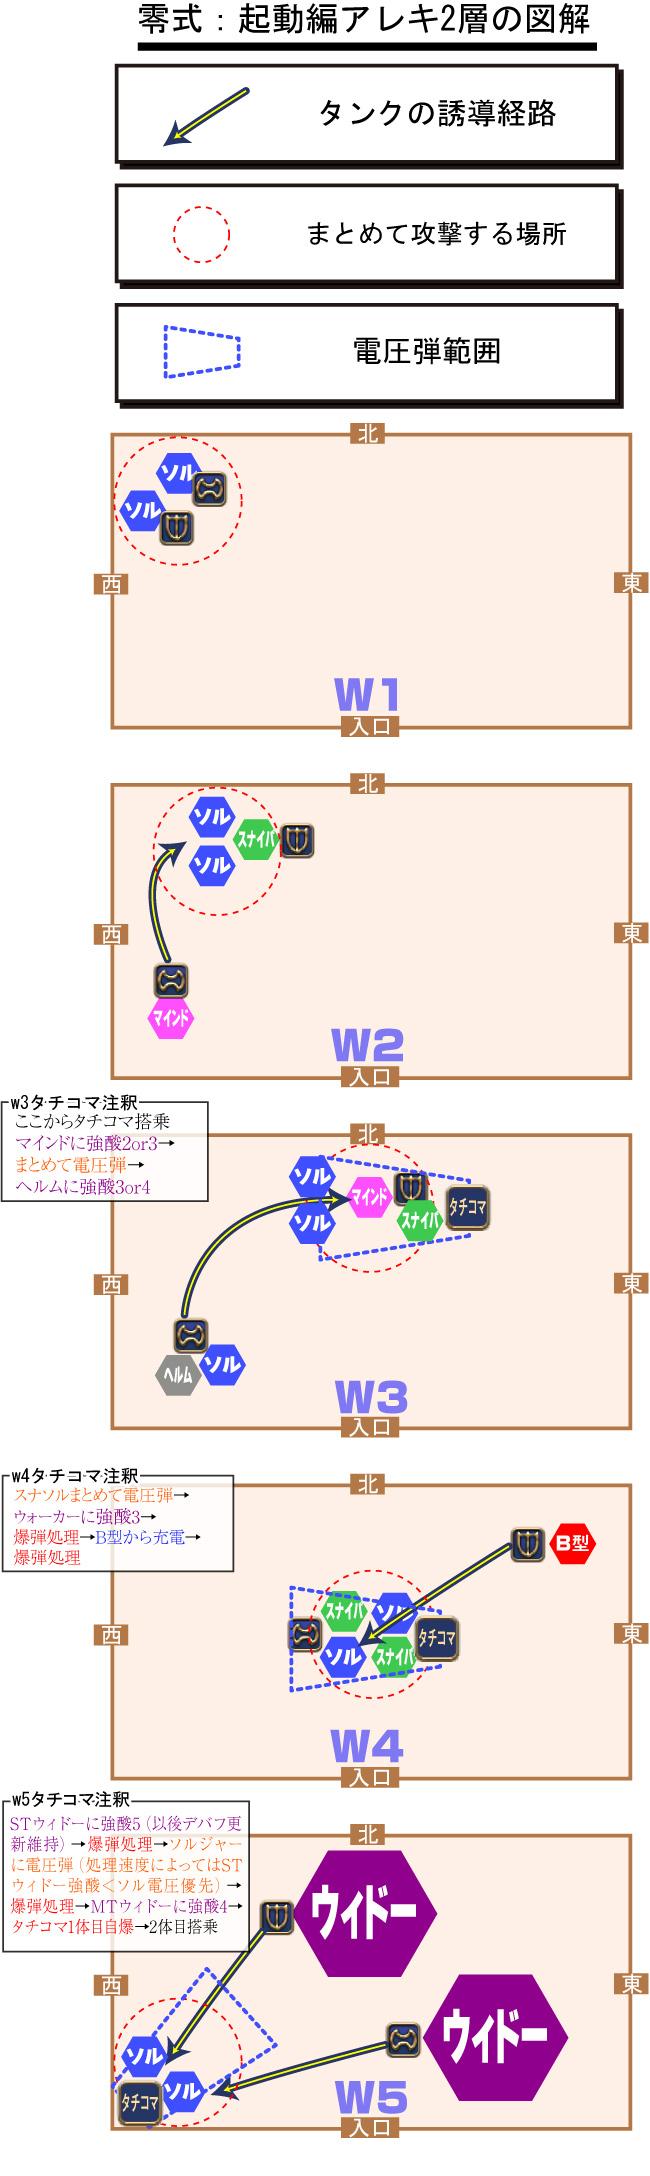 areki02-matome-tate01.jpg